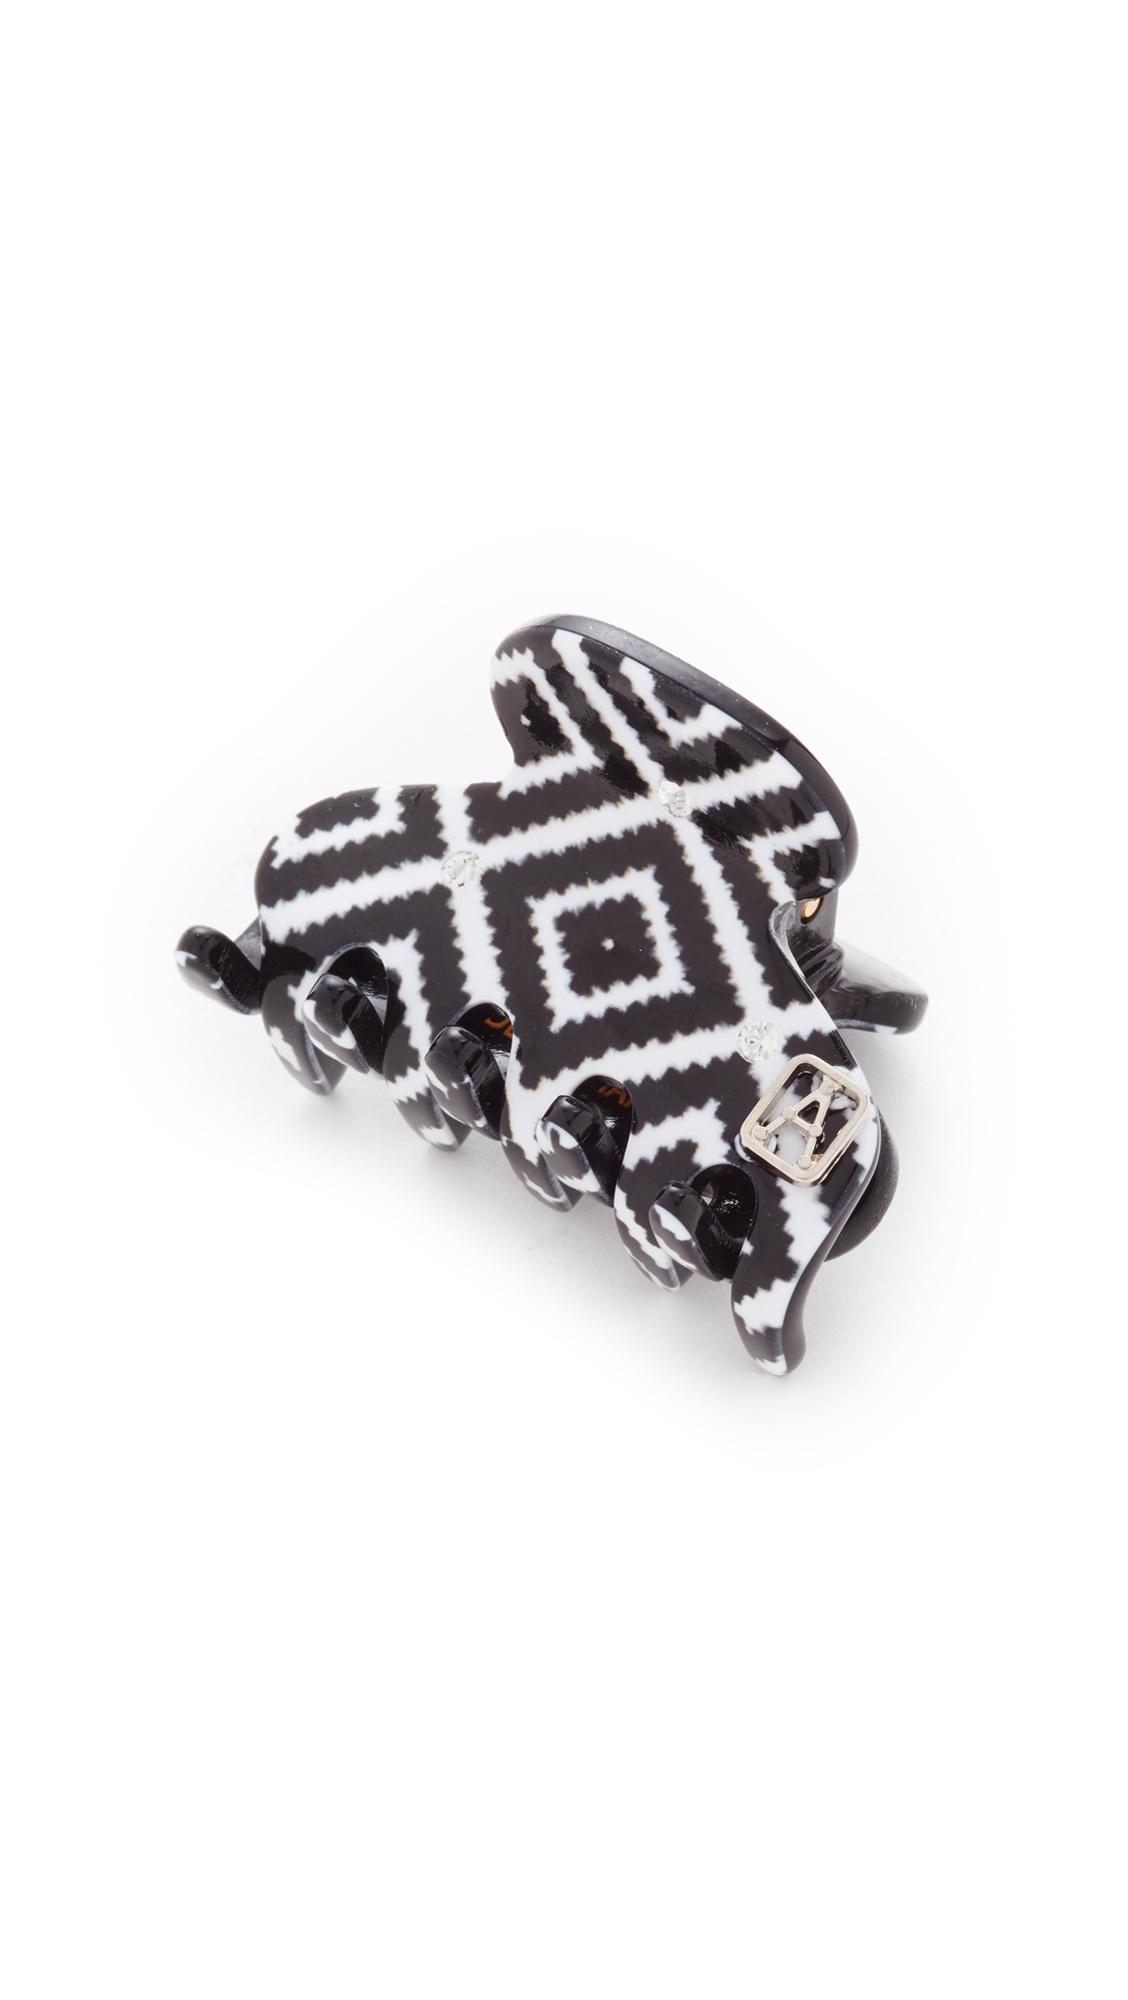 Alexandre de Paris Ameridan Jaw Hair Clip - Black/White